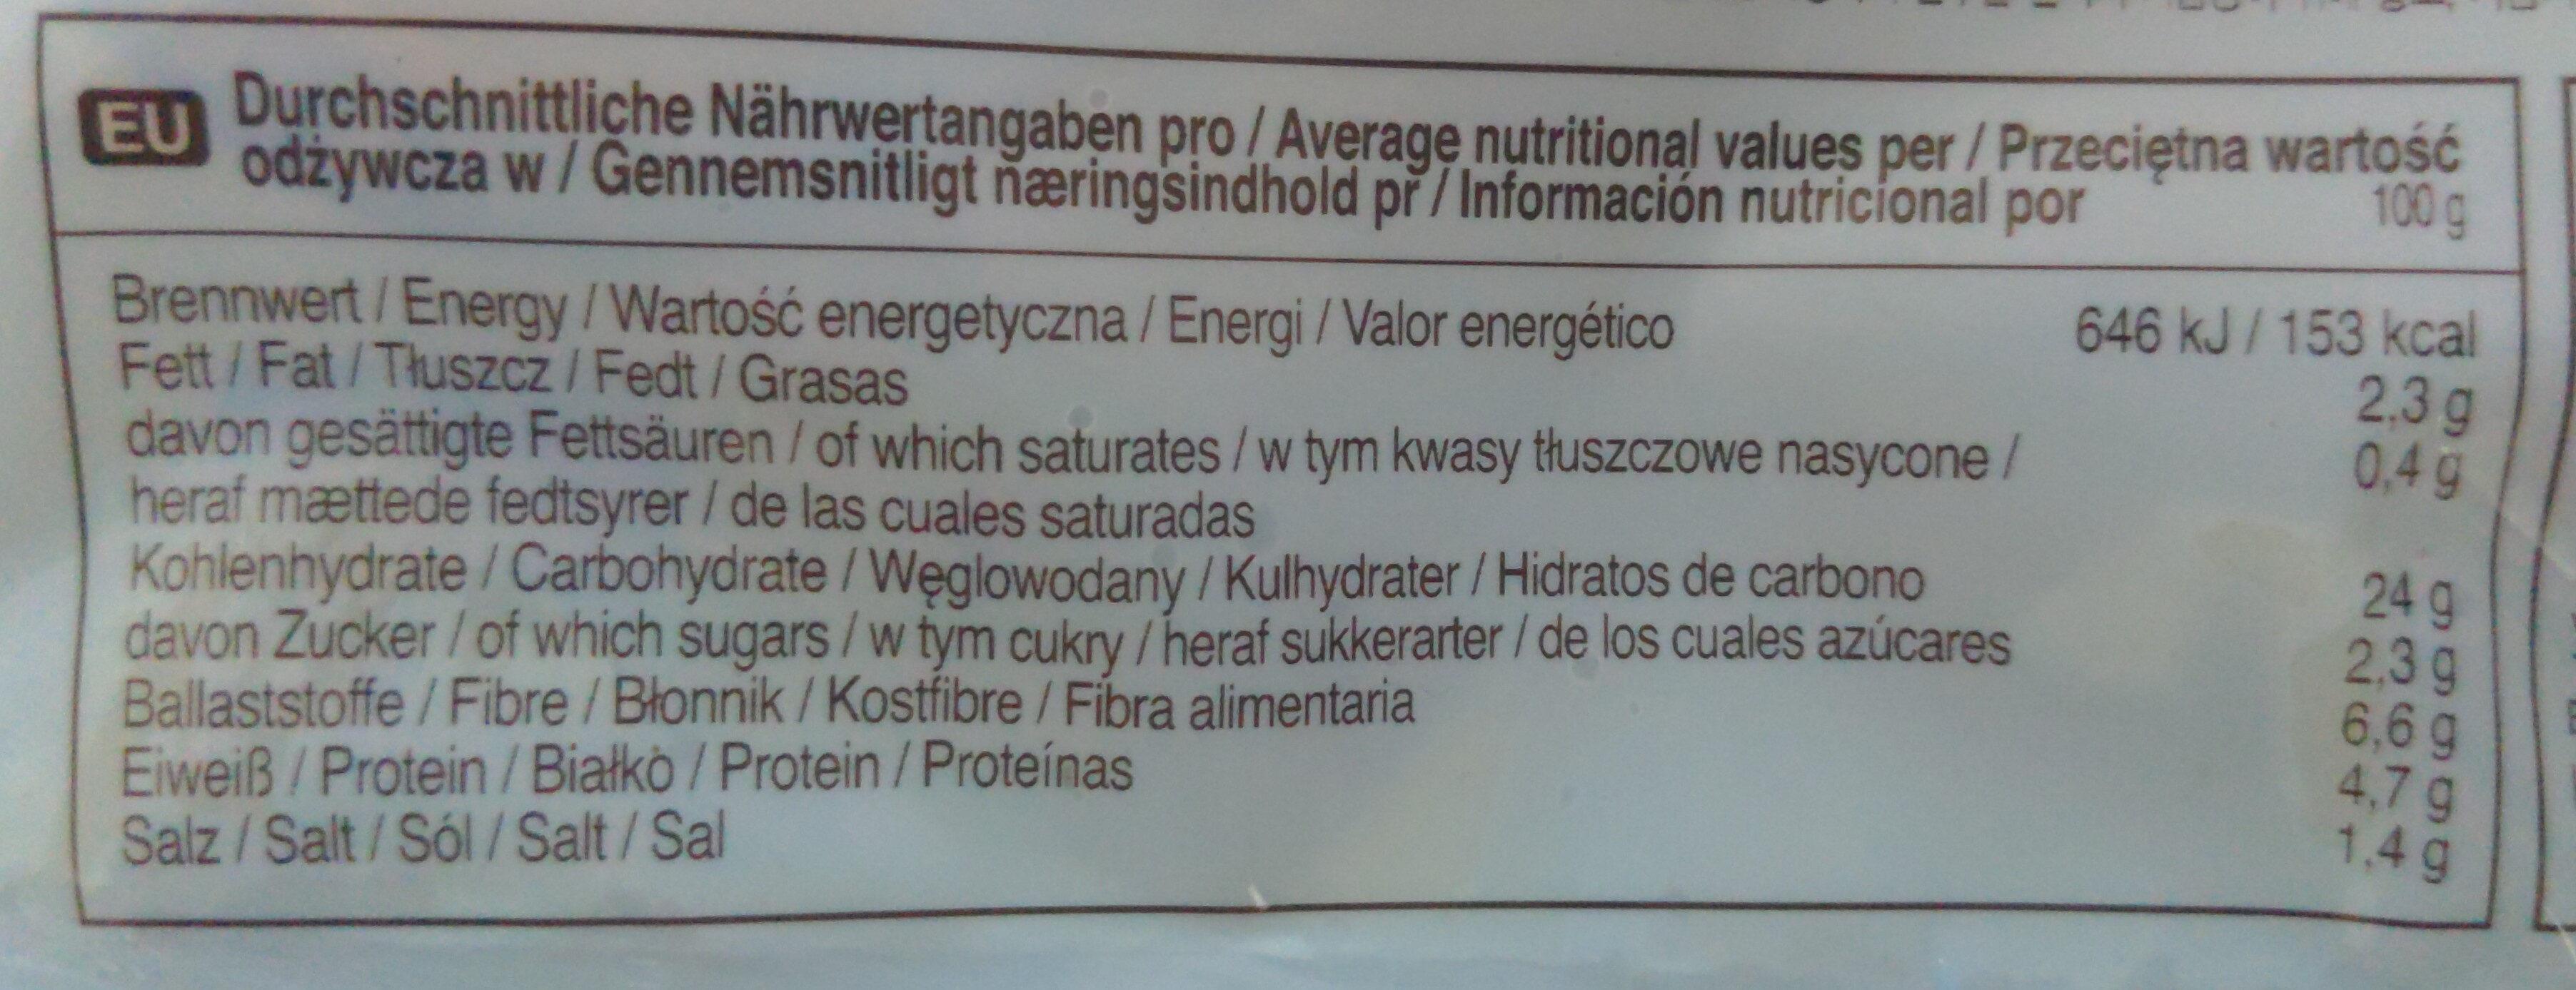 Teigtaschen mit Garnelen tiefgefroren - Nutrition facts - de